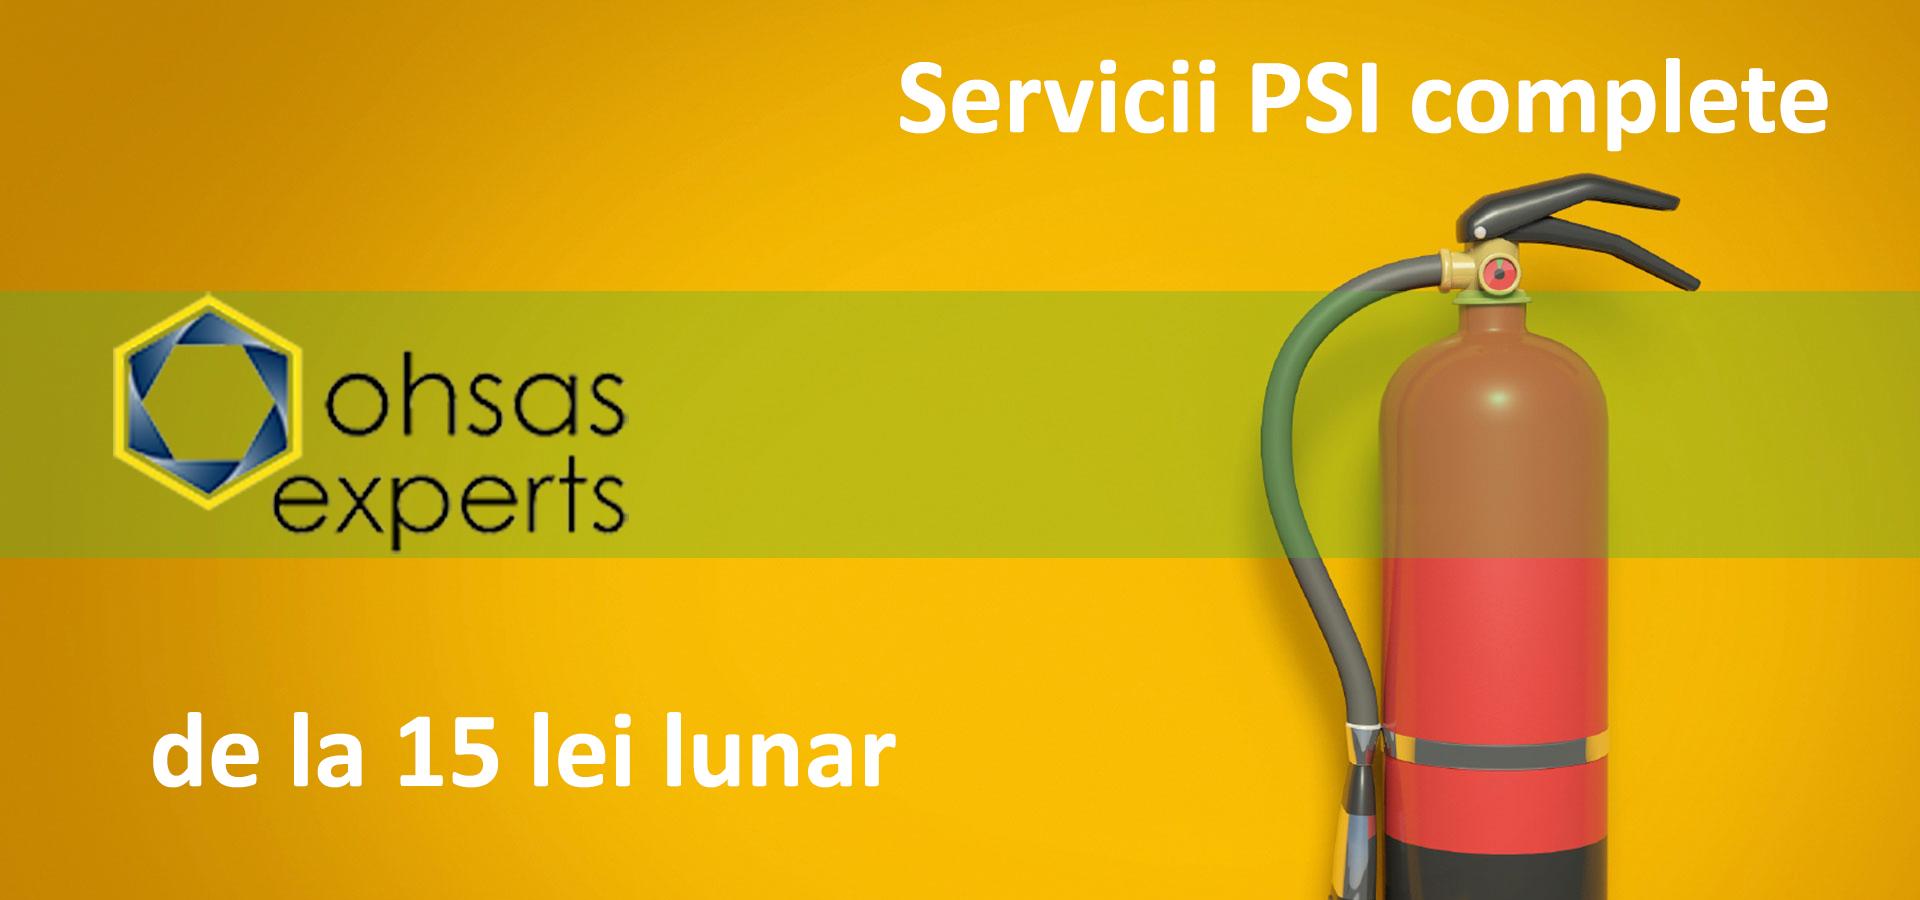 servicii-complete-psi